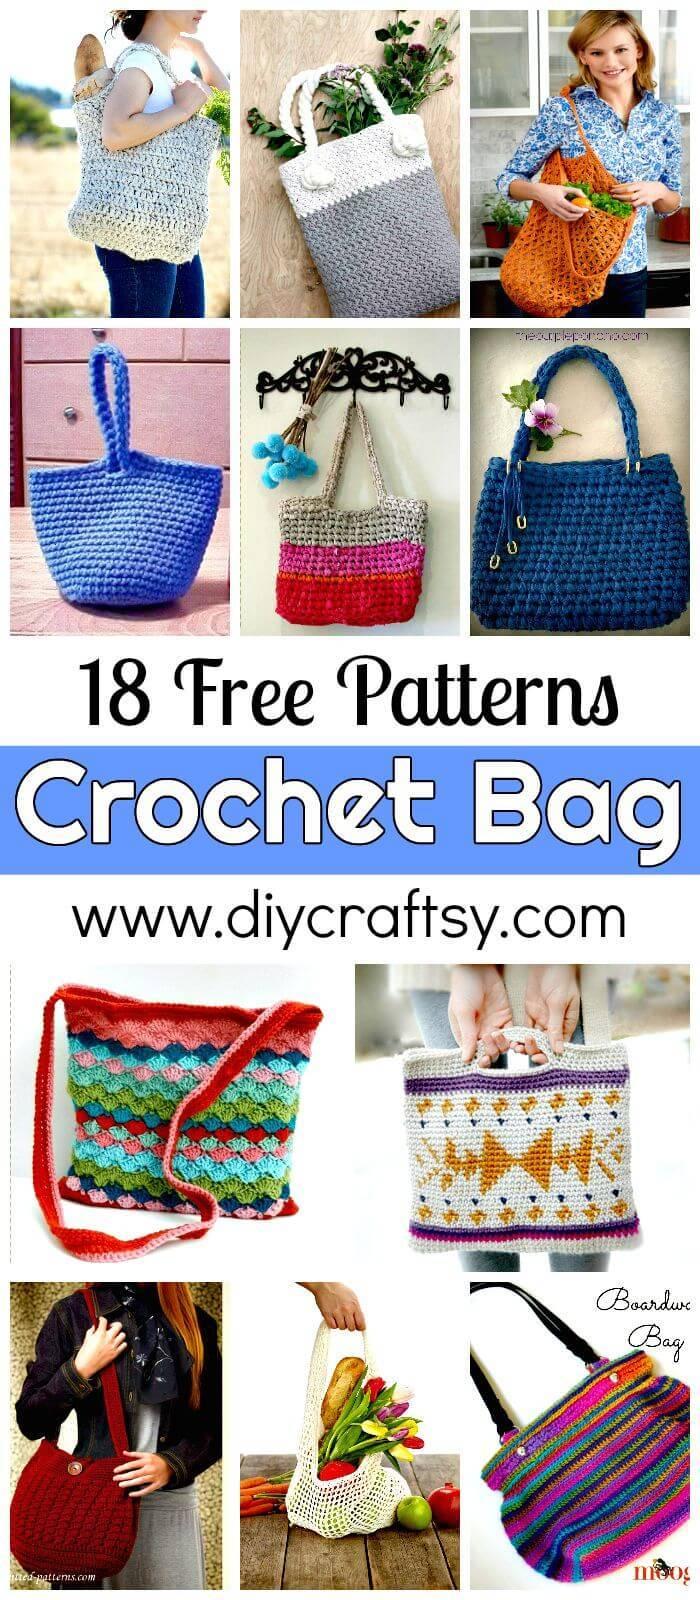 18 Free Crochet Bag Patterns - Crochet Tote Bags